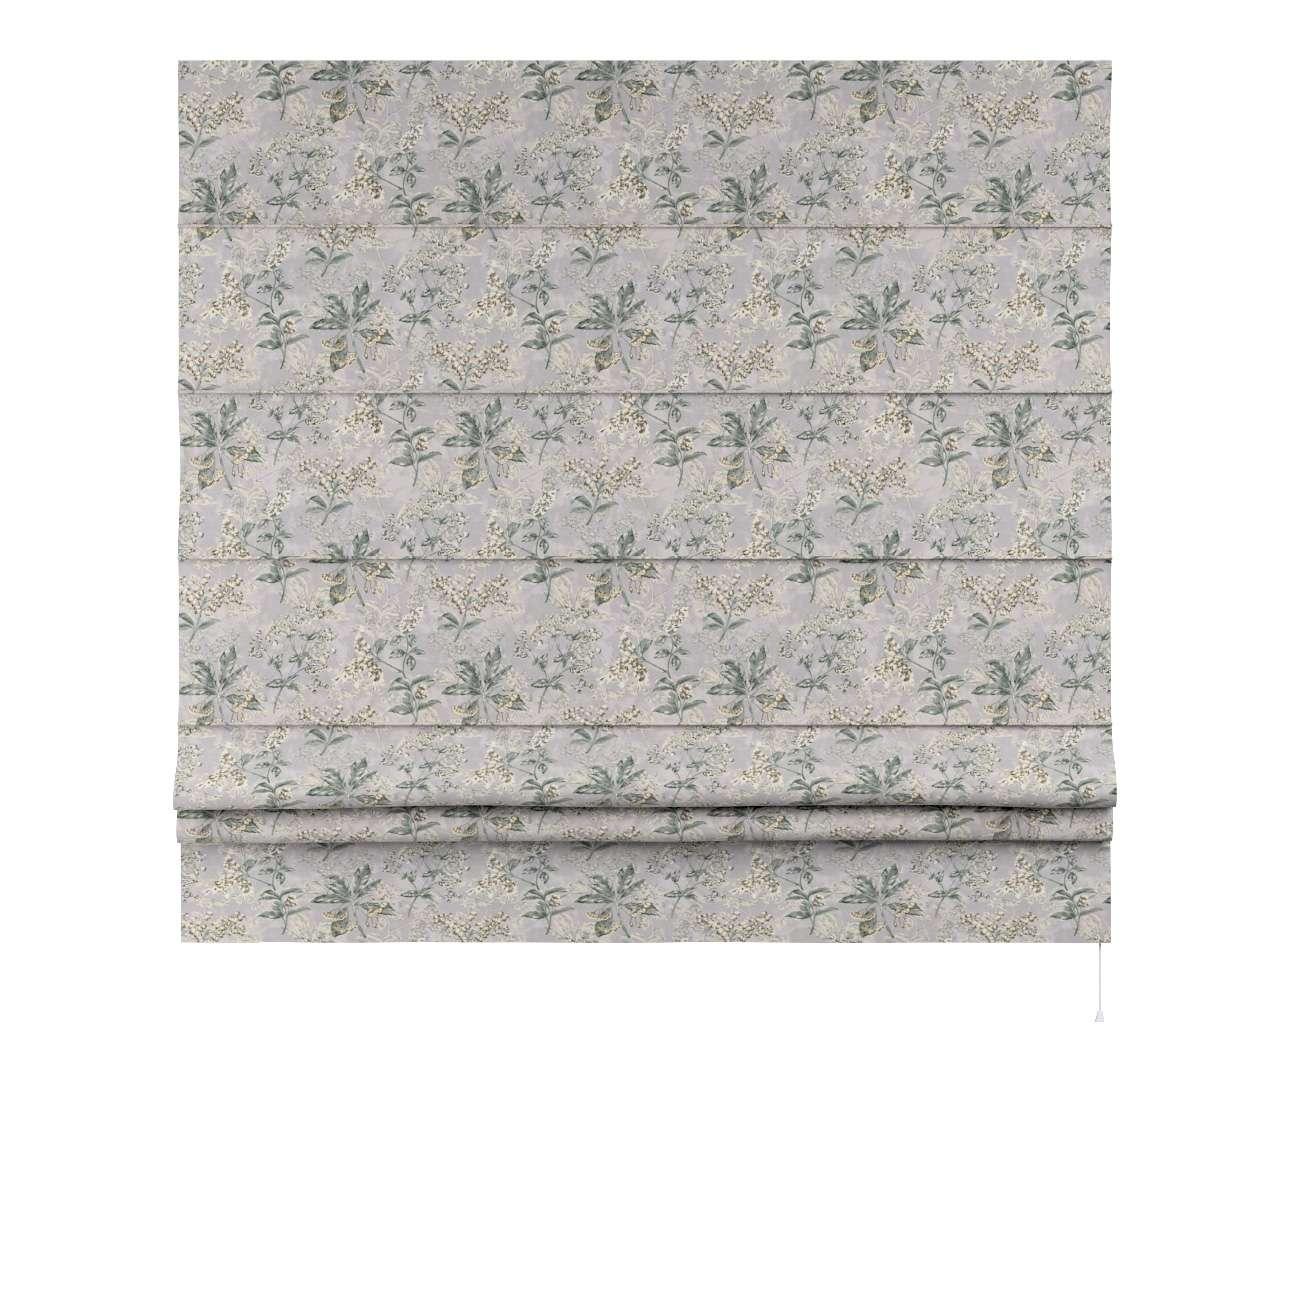 Rímska roleta Padva V kolekcii Londres, tkanina: 143-37